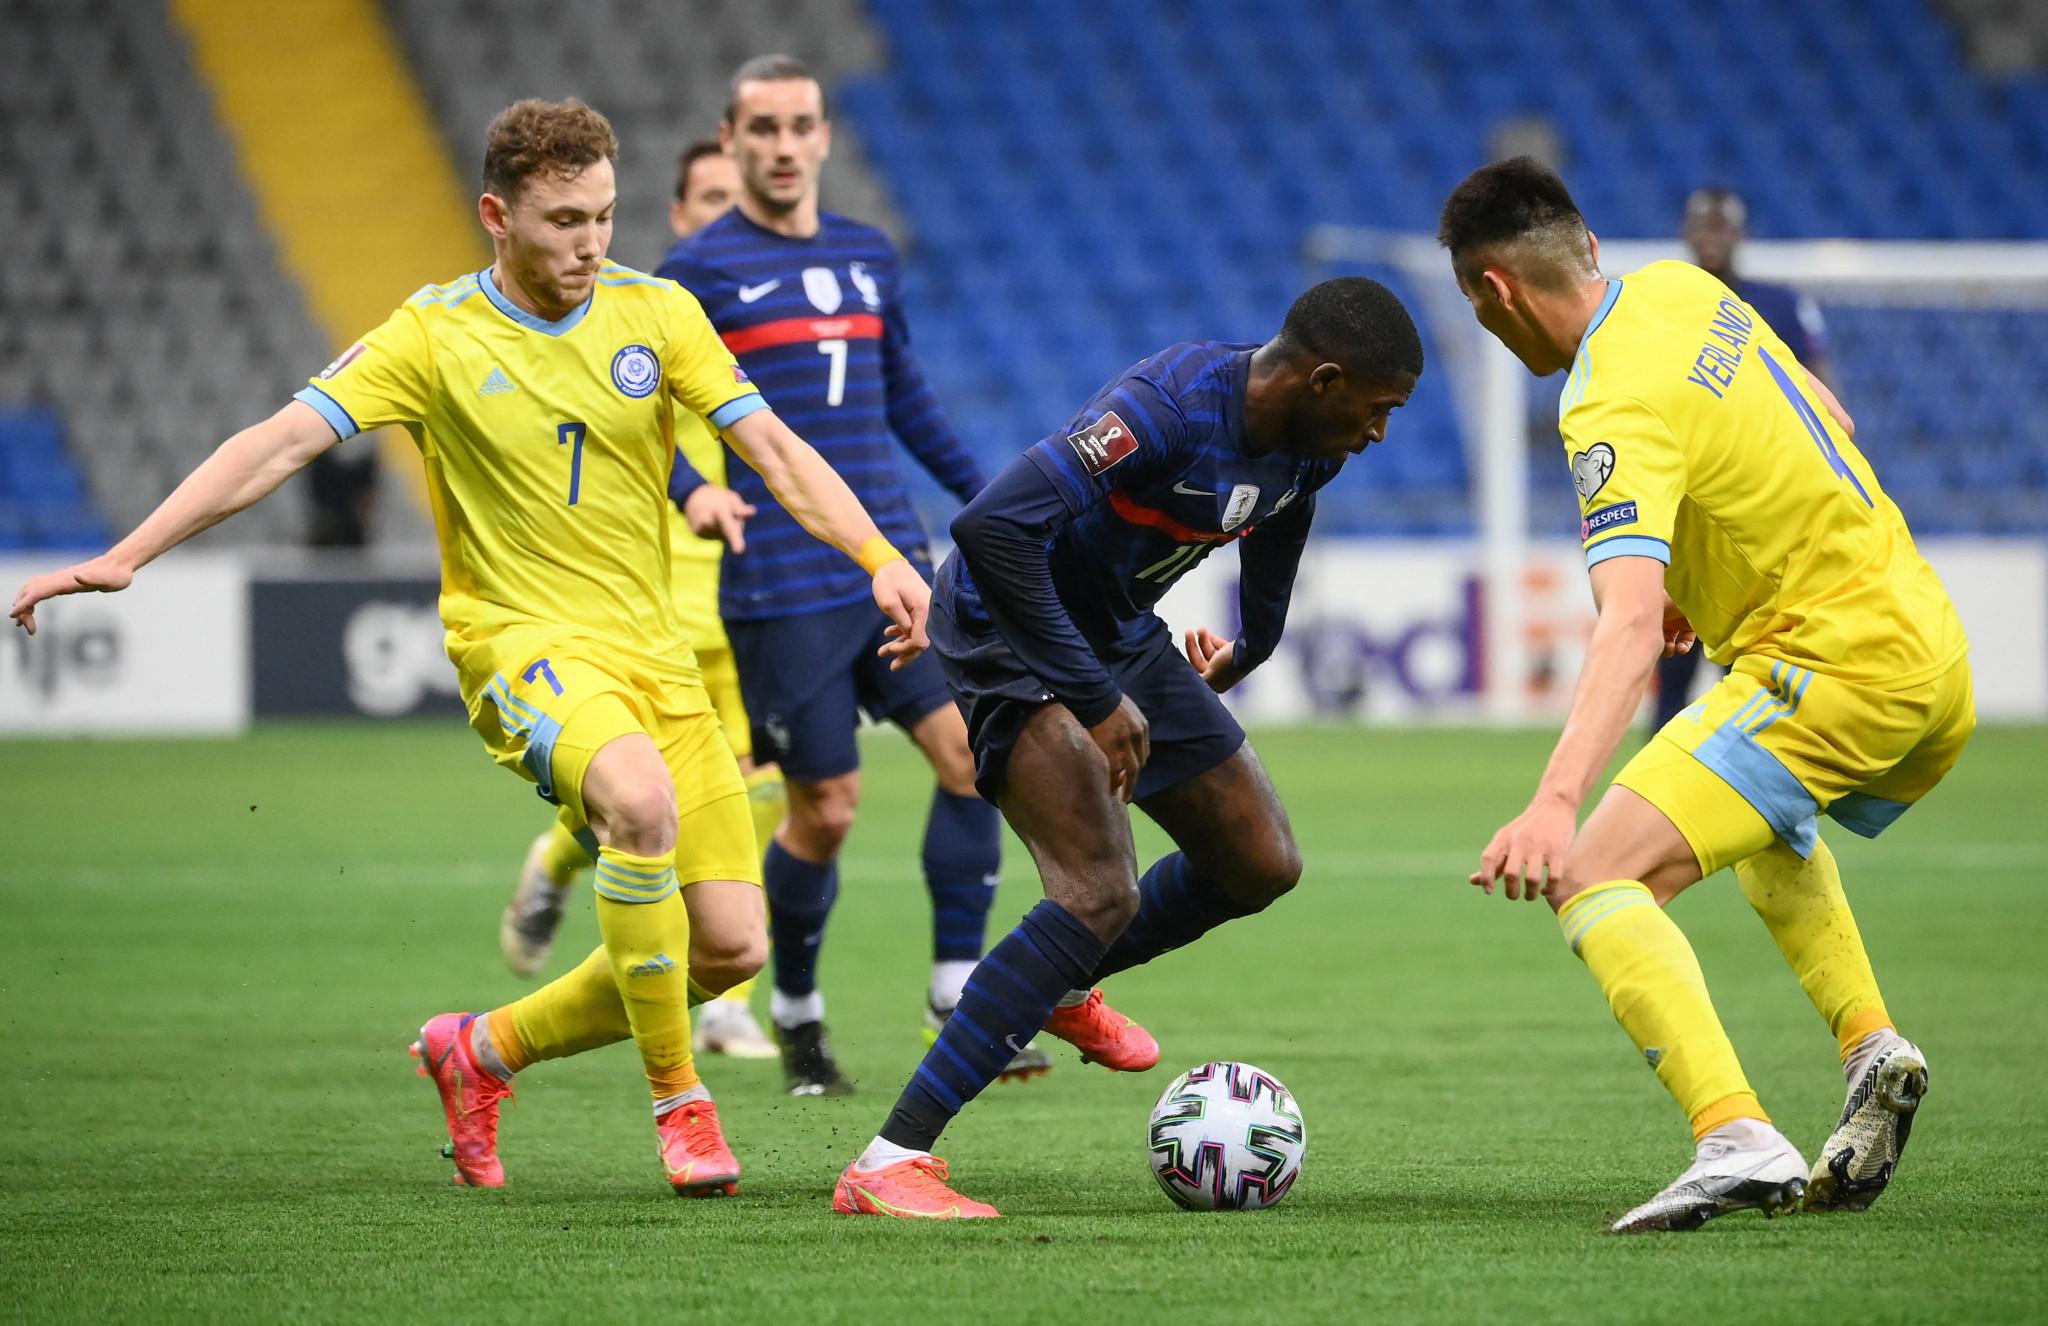 Ruslan Valiullin fails UEFA doping test after scoring twice for Kazakhstan